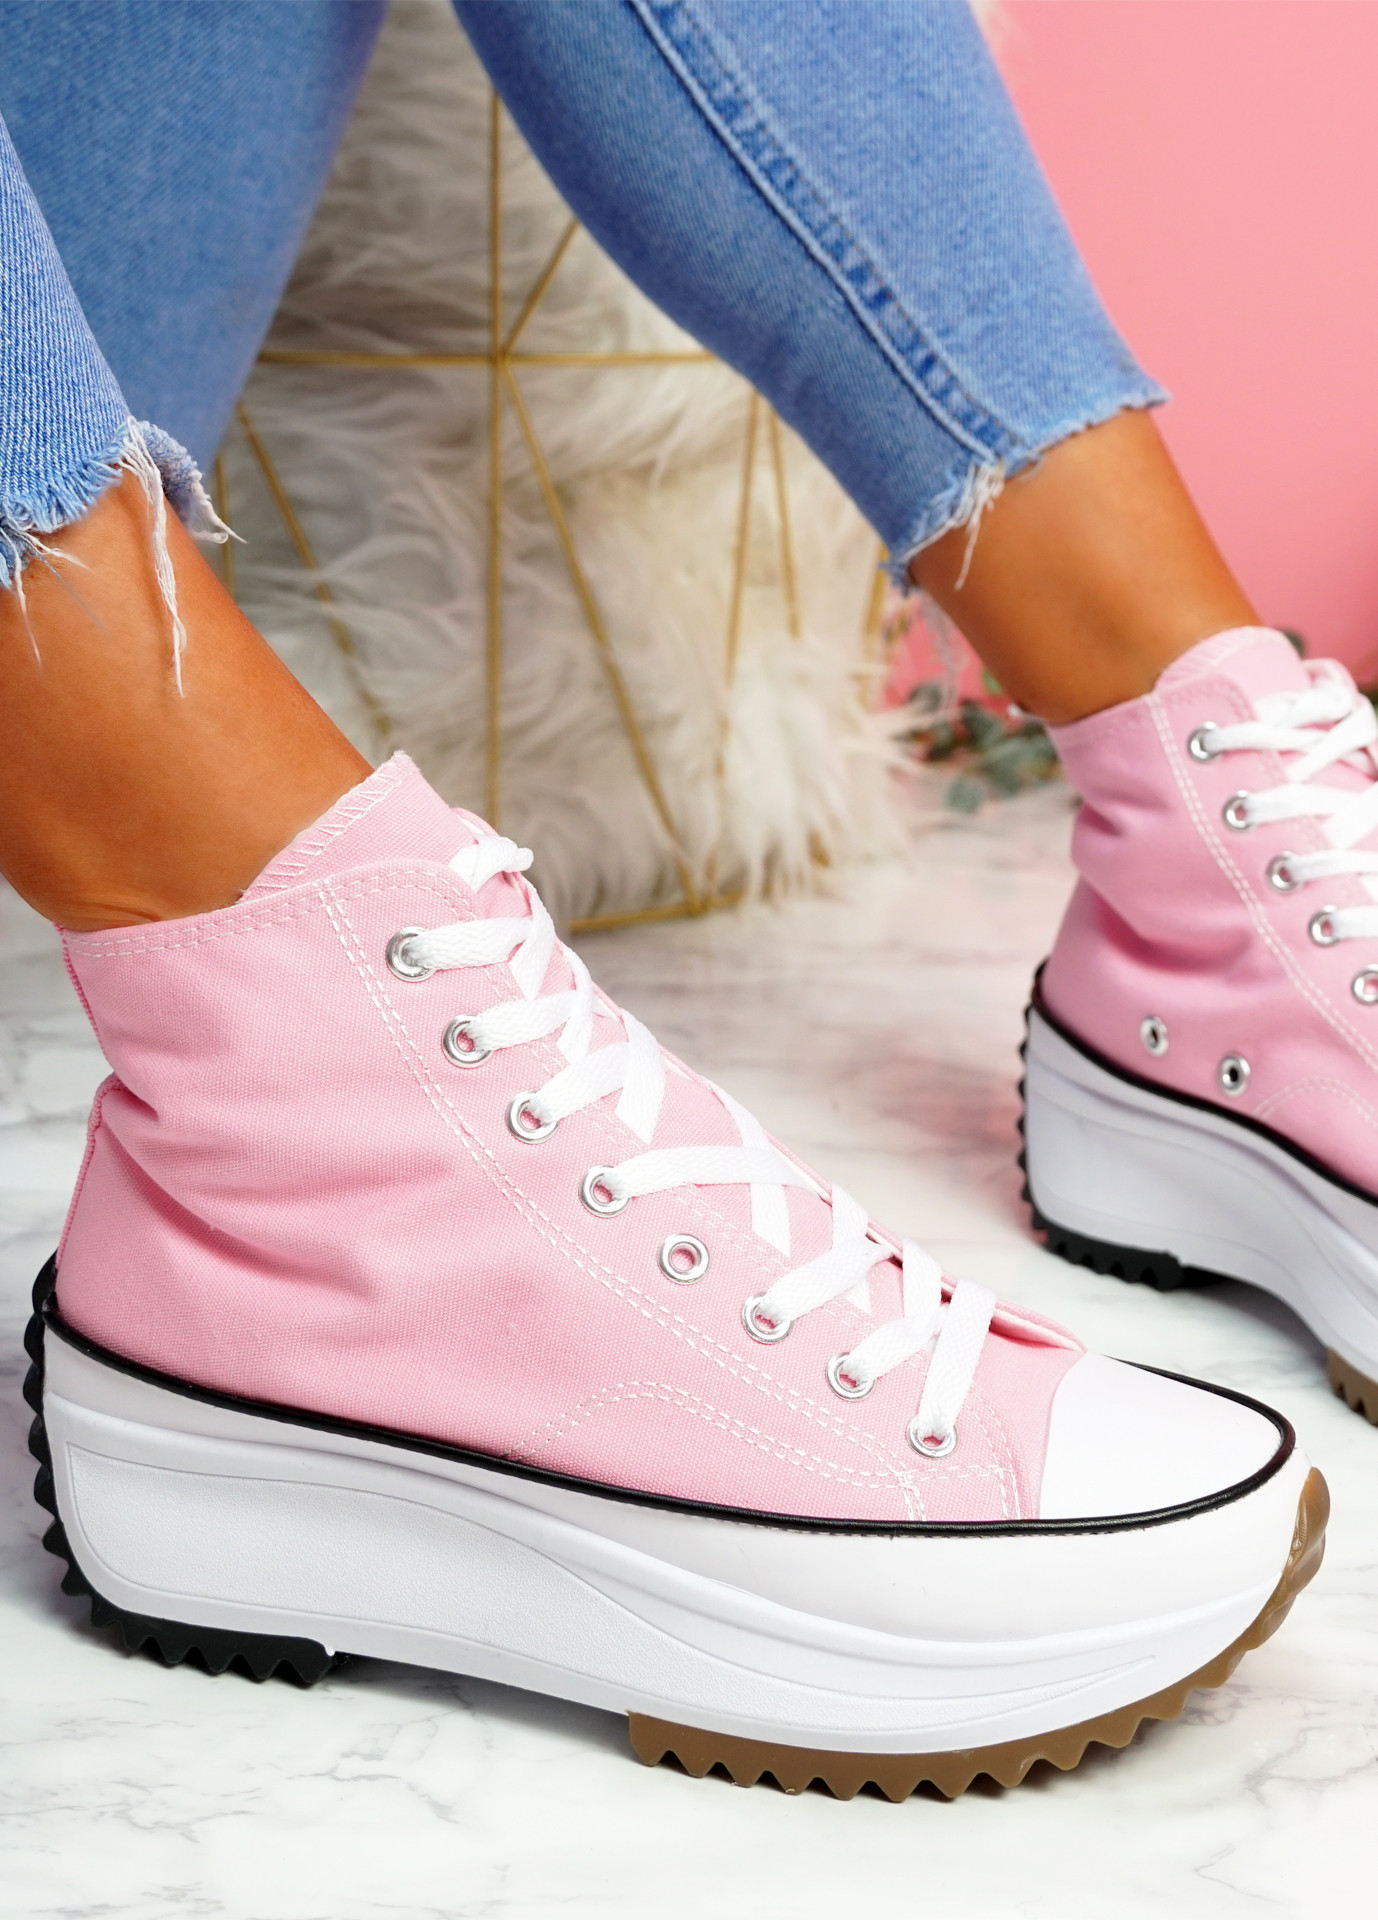 Nuve Pink Flatform Trainers